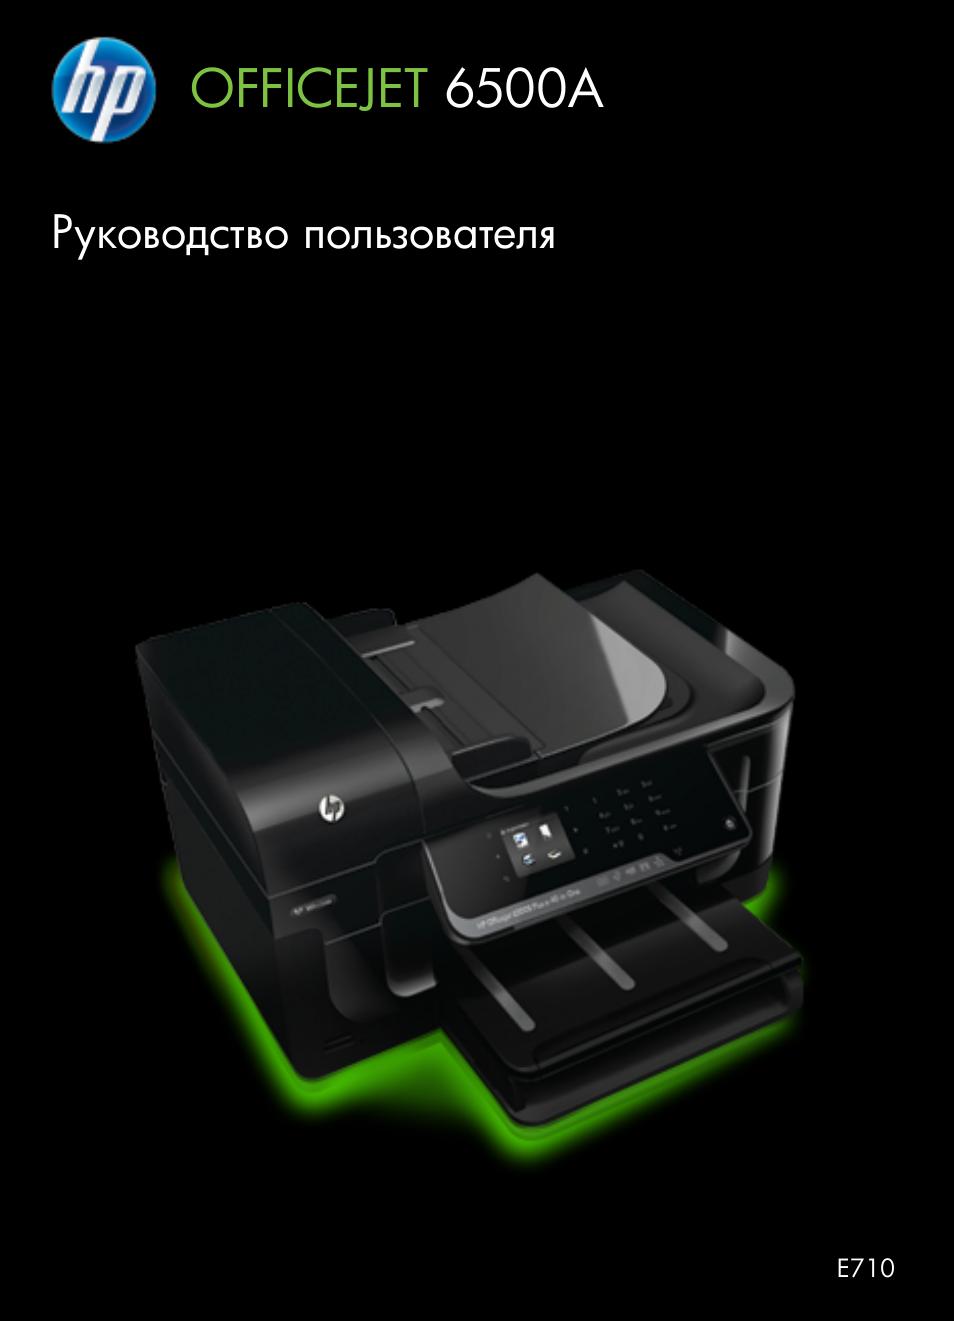 Инструкция по эксплуатации HP Officejet 6500A Plus | 280 страниц | Также  для: Officejet 6500A